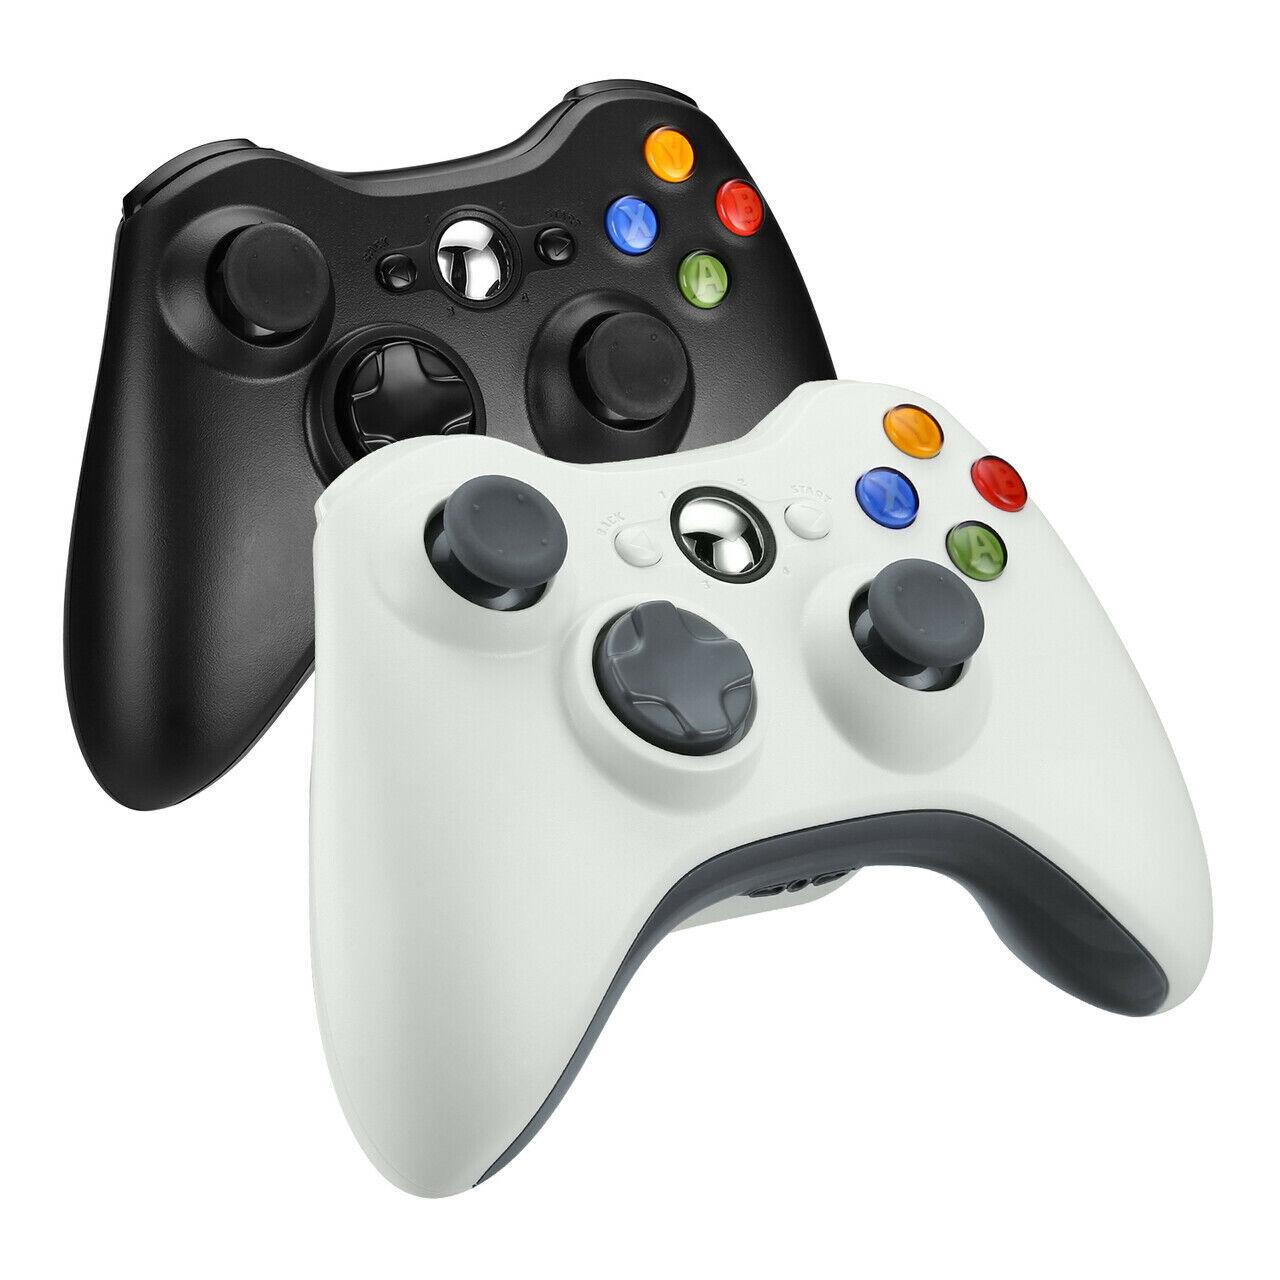 Wireless Game Controller Gamepad Joystick for Microsoft XBOX